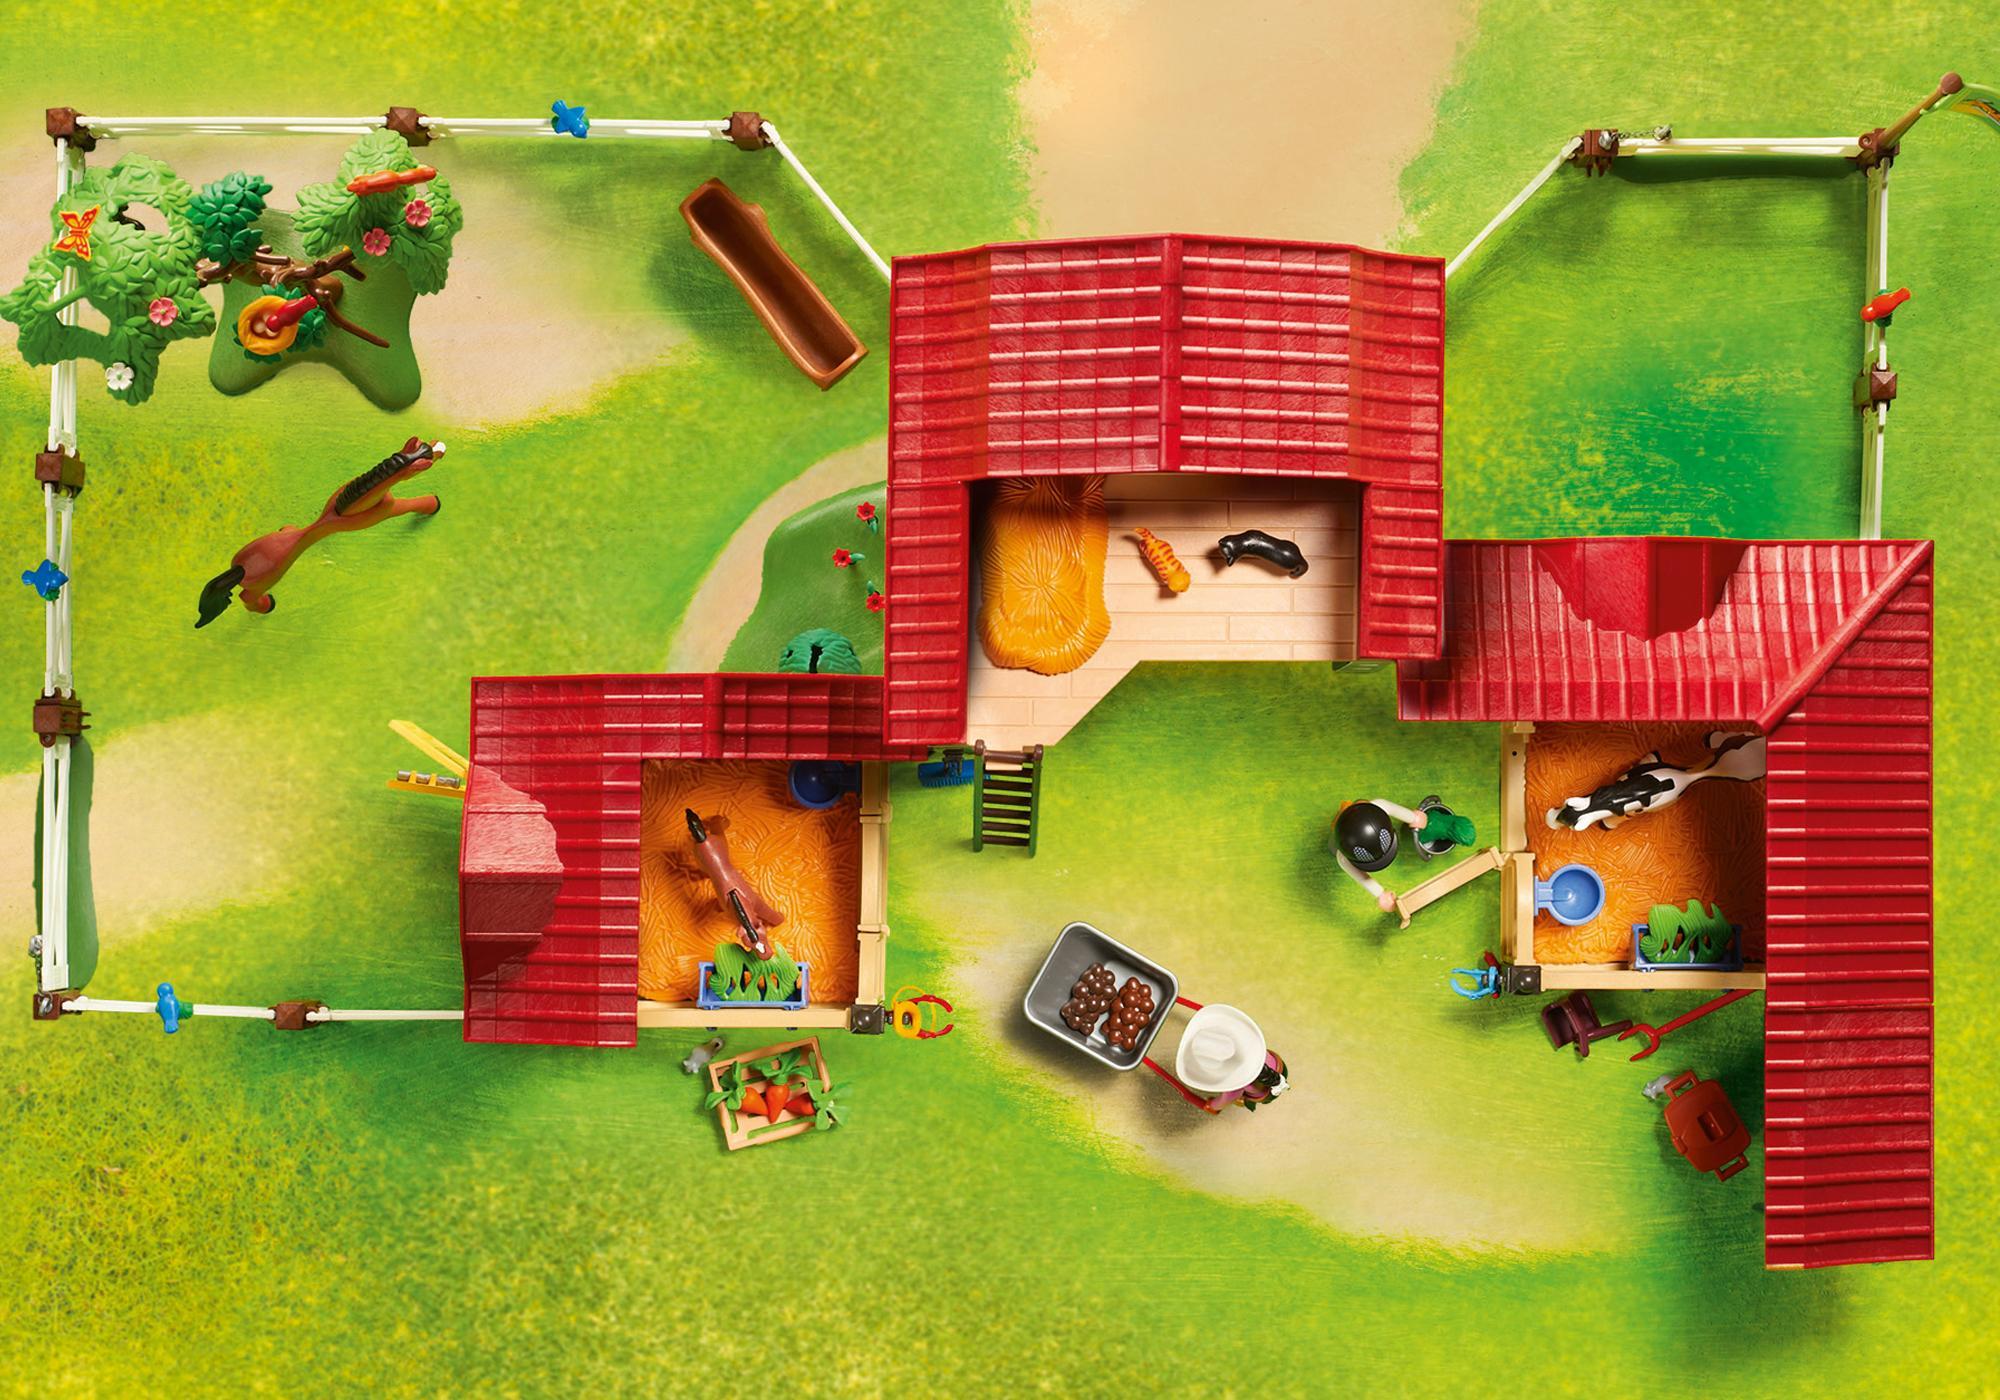 http://media.playmobil.com/i/playmobil/6926_product_extra1/Granja de Caballos